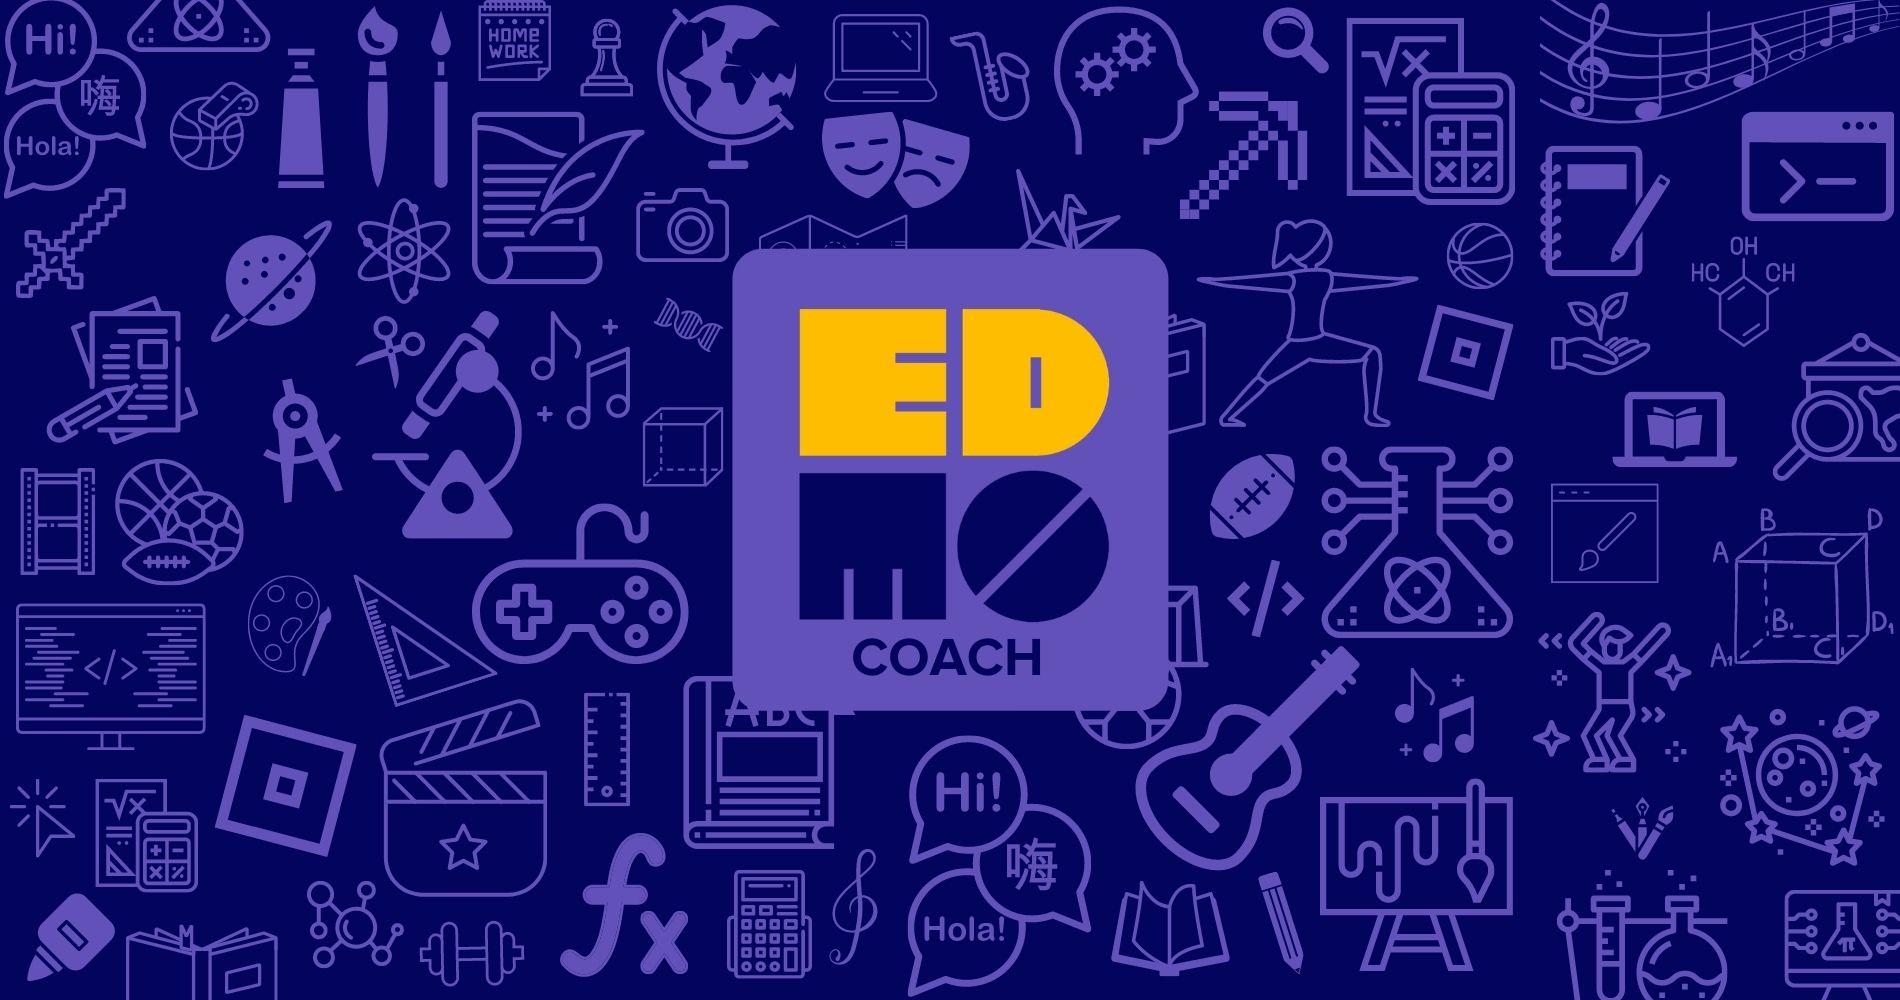 EDMO Coach - Online tutoring for PK-12